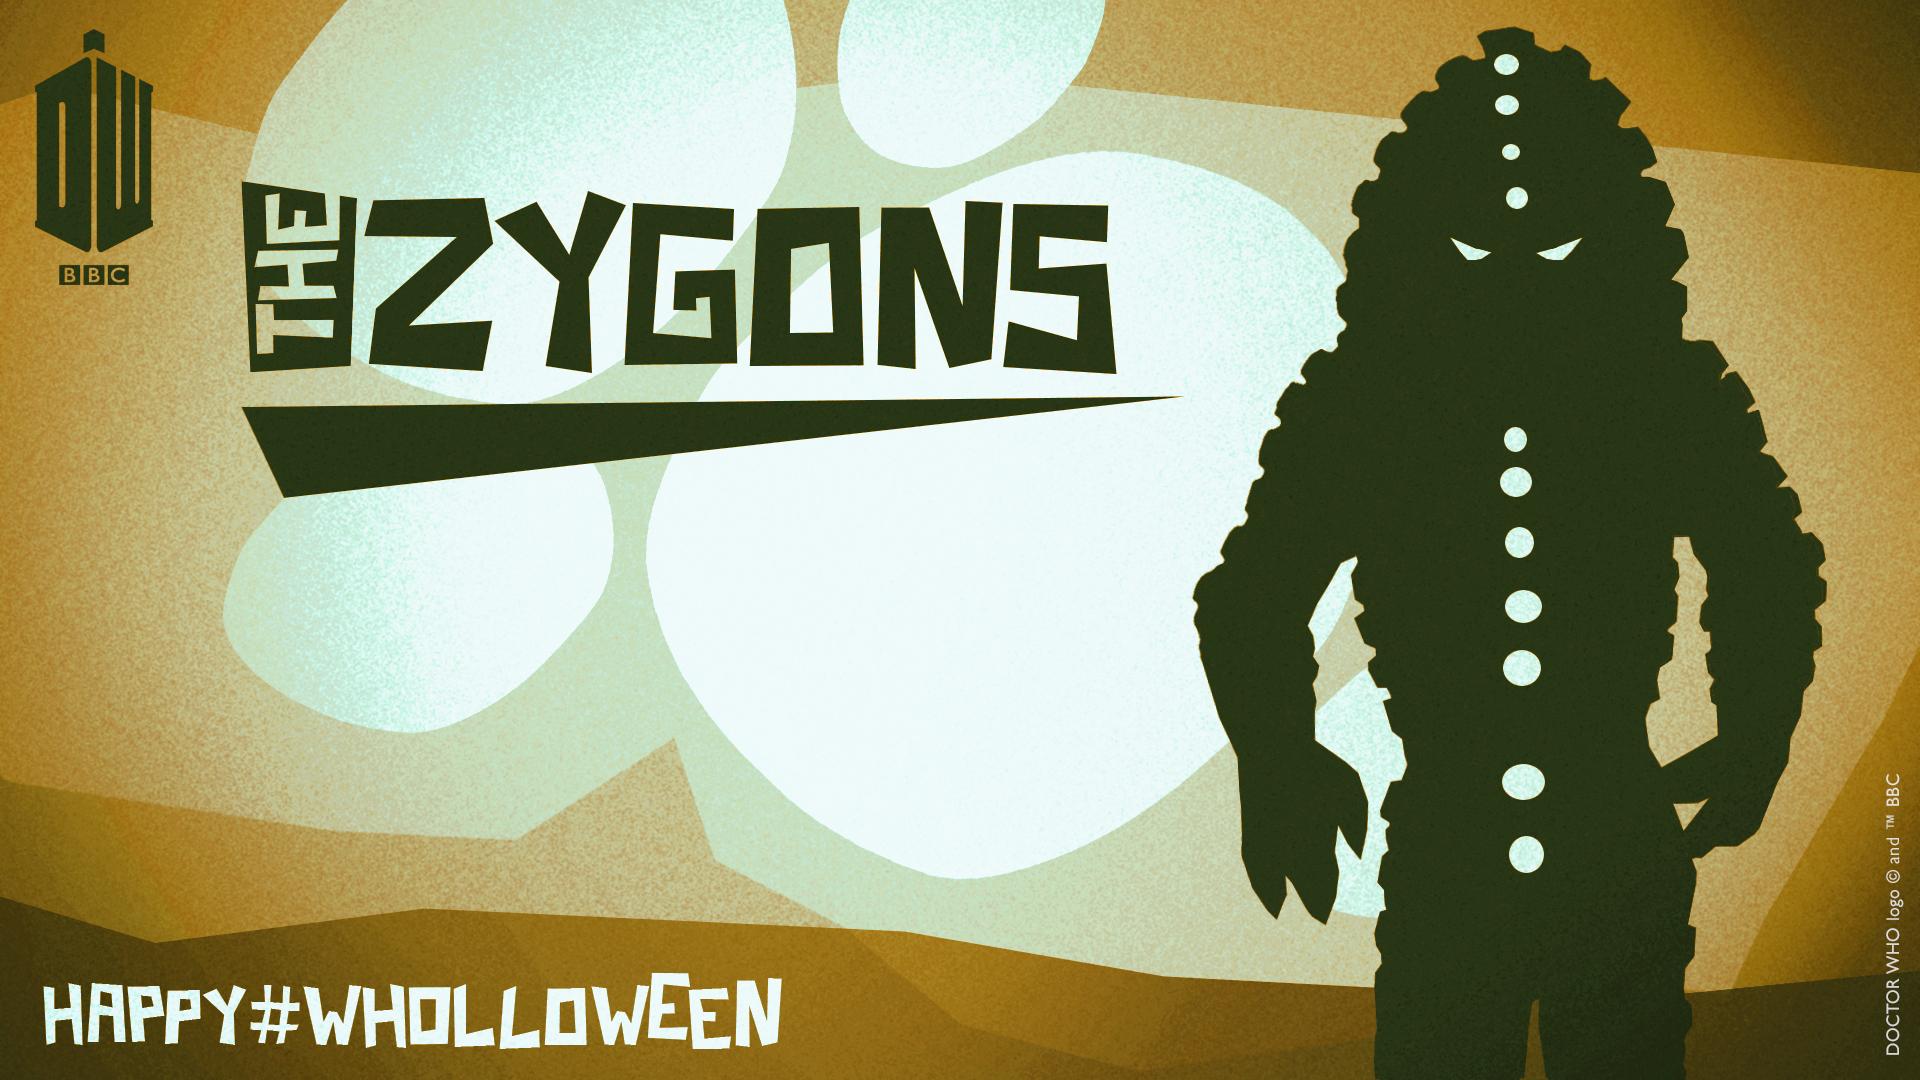 Desktop Wallpaper ZYGONS